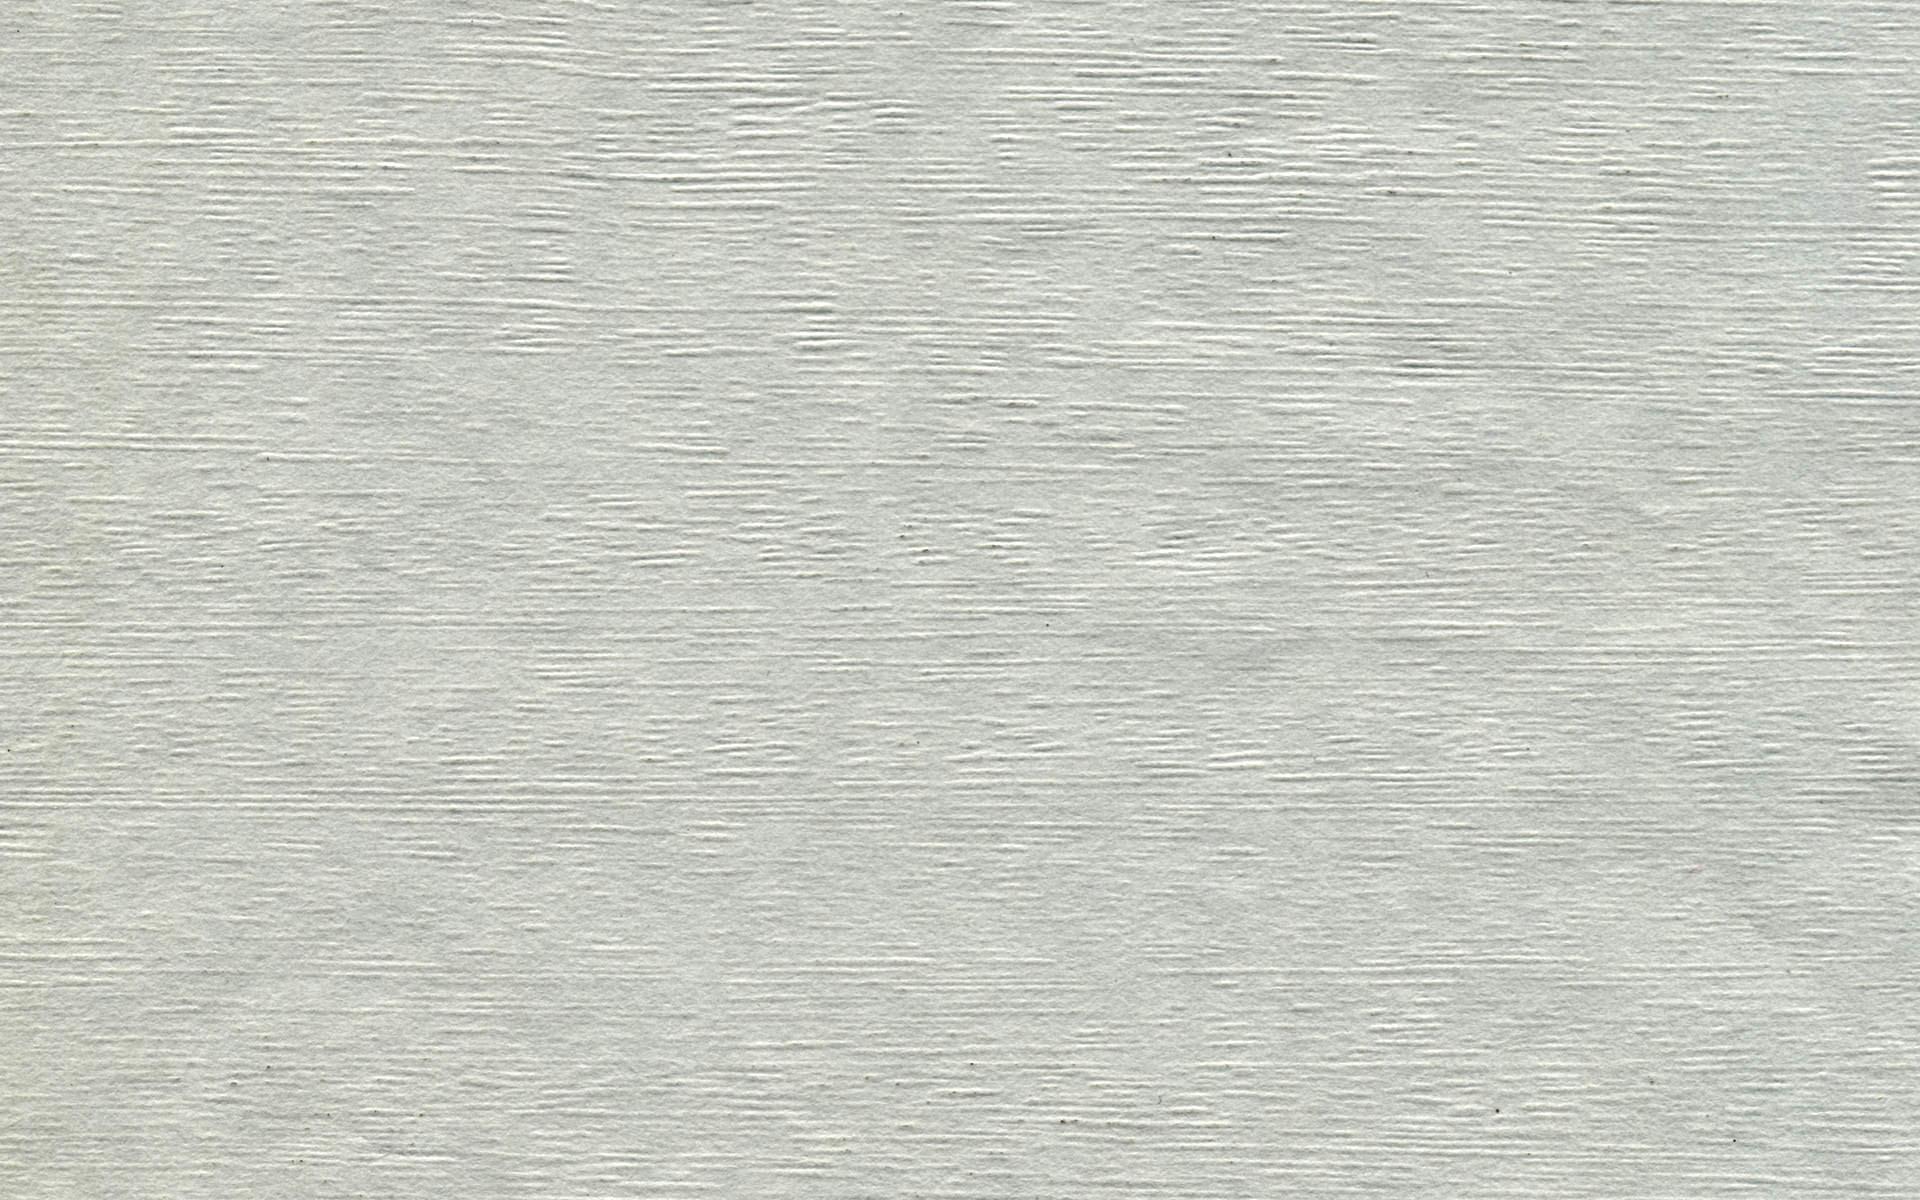 Plain White Backgrounds